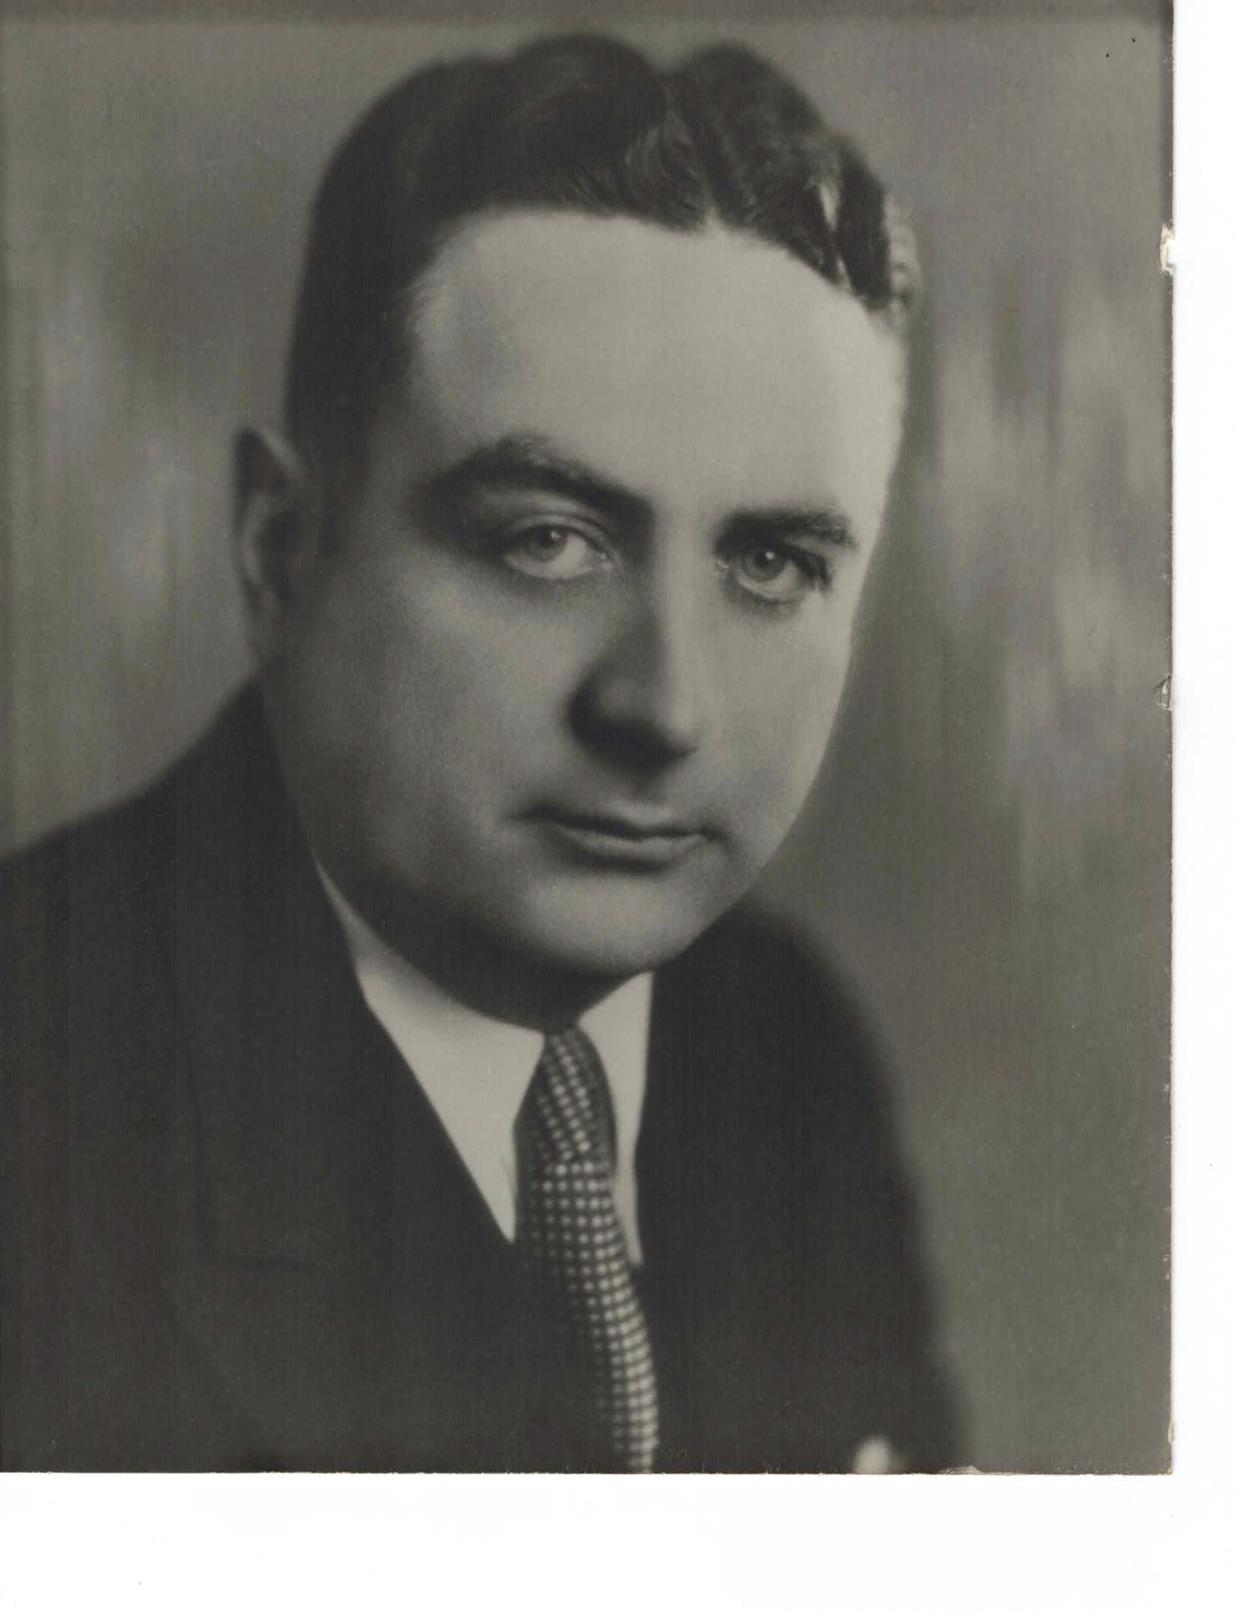 DR. JAMES H. MATTHEWS 1943-44